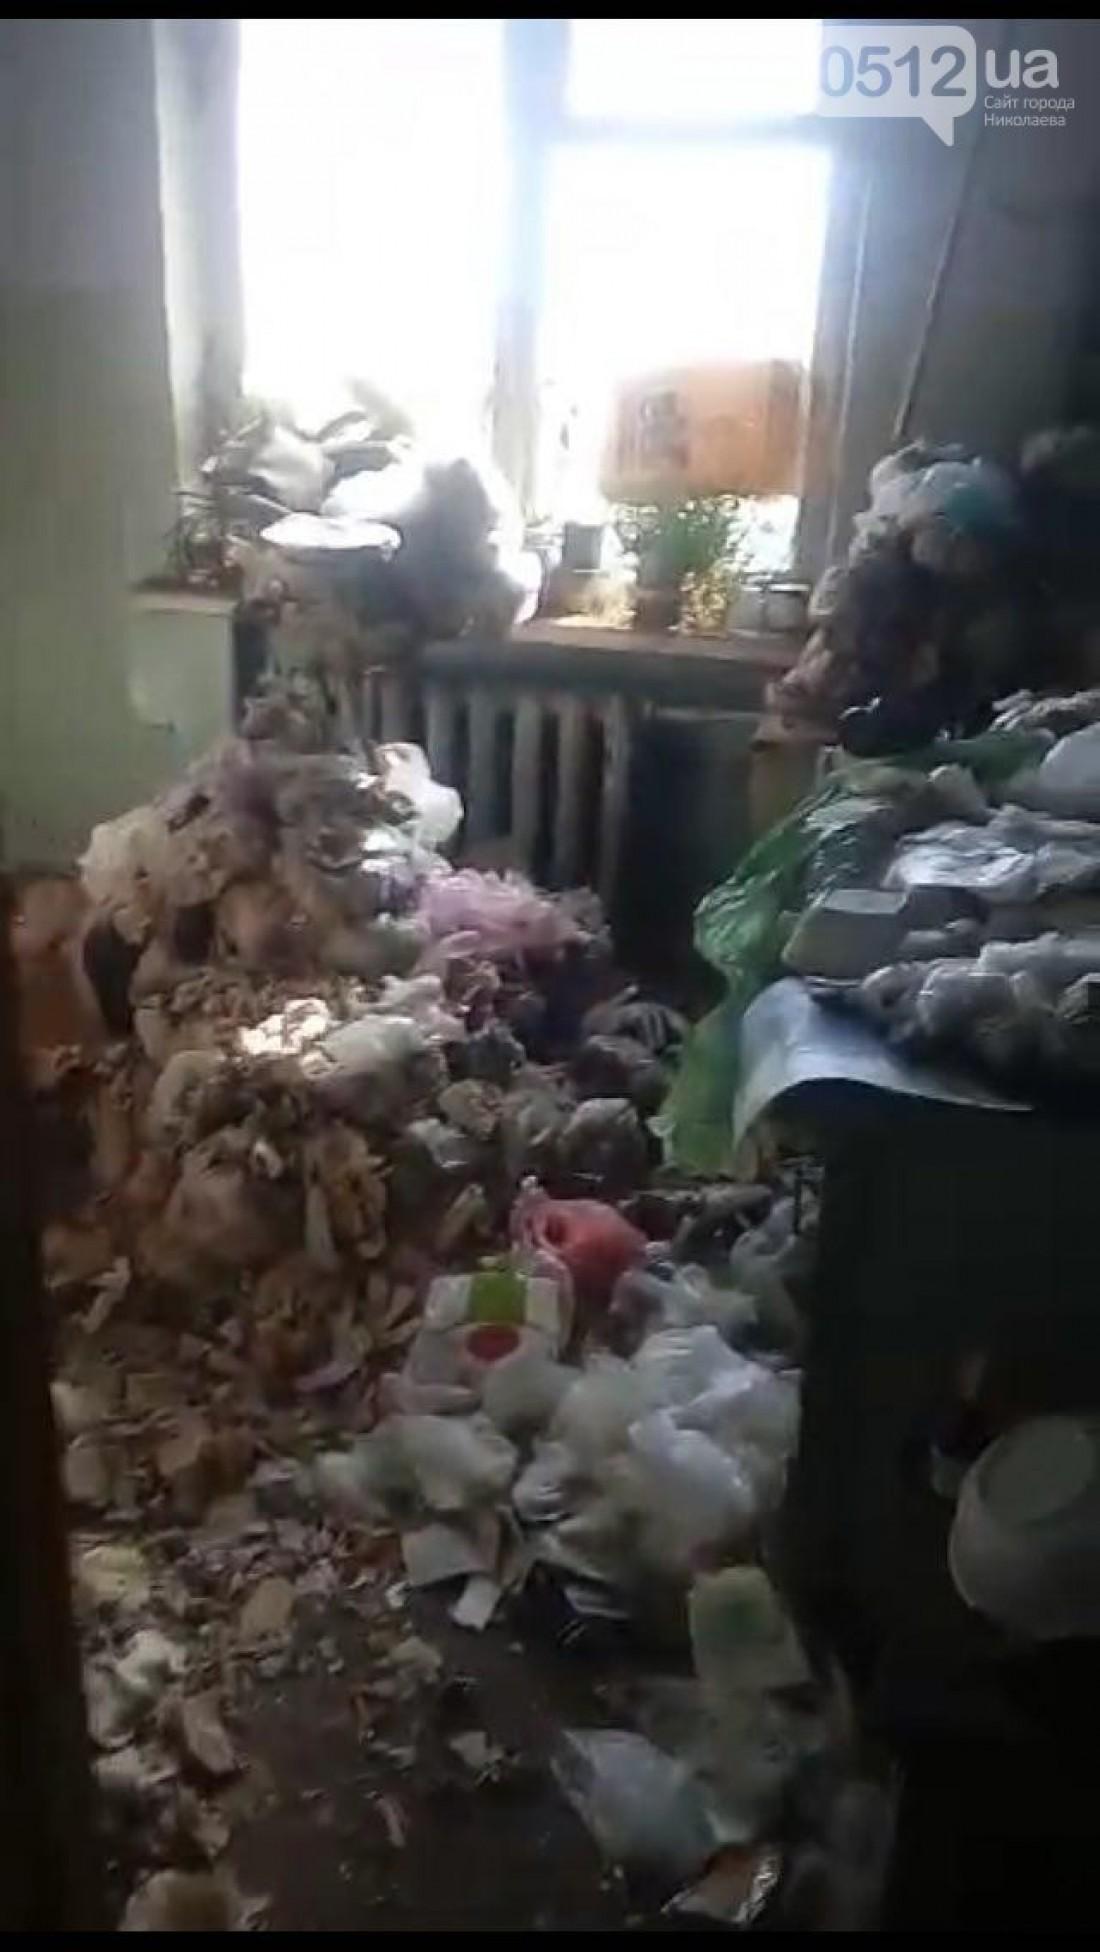 Квартира была завалена мусором